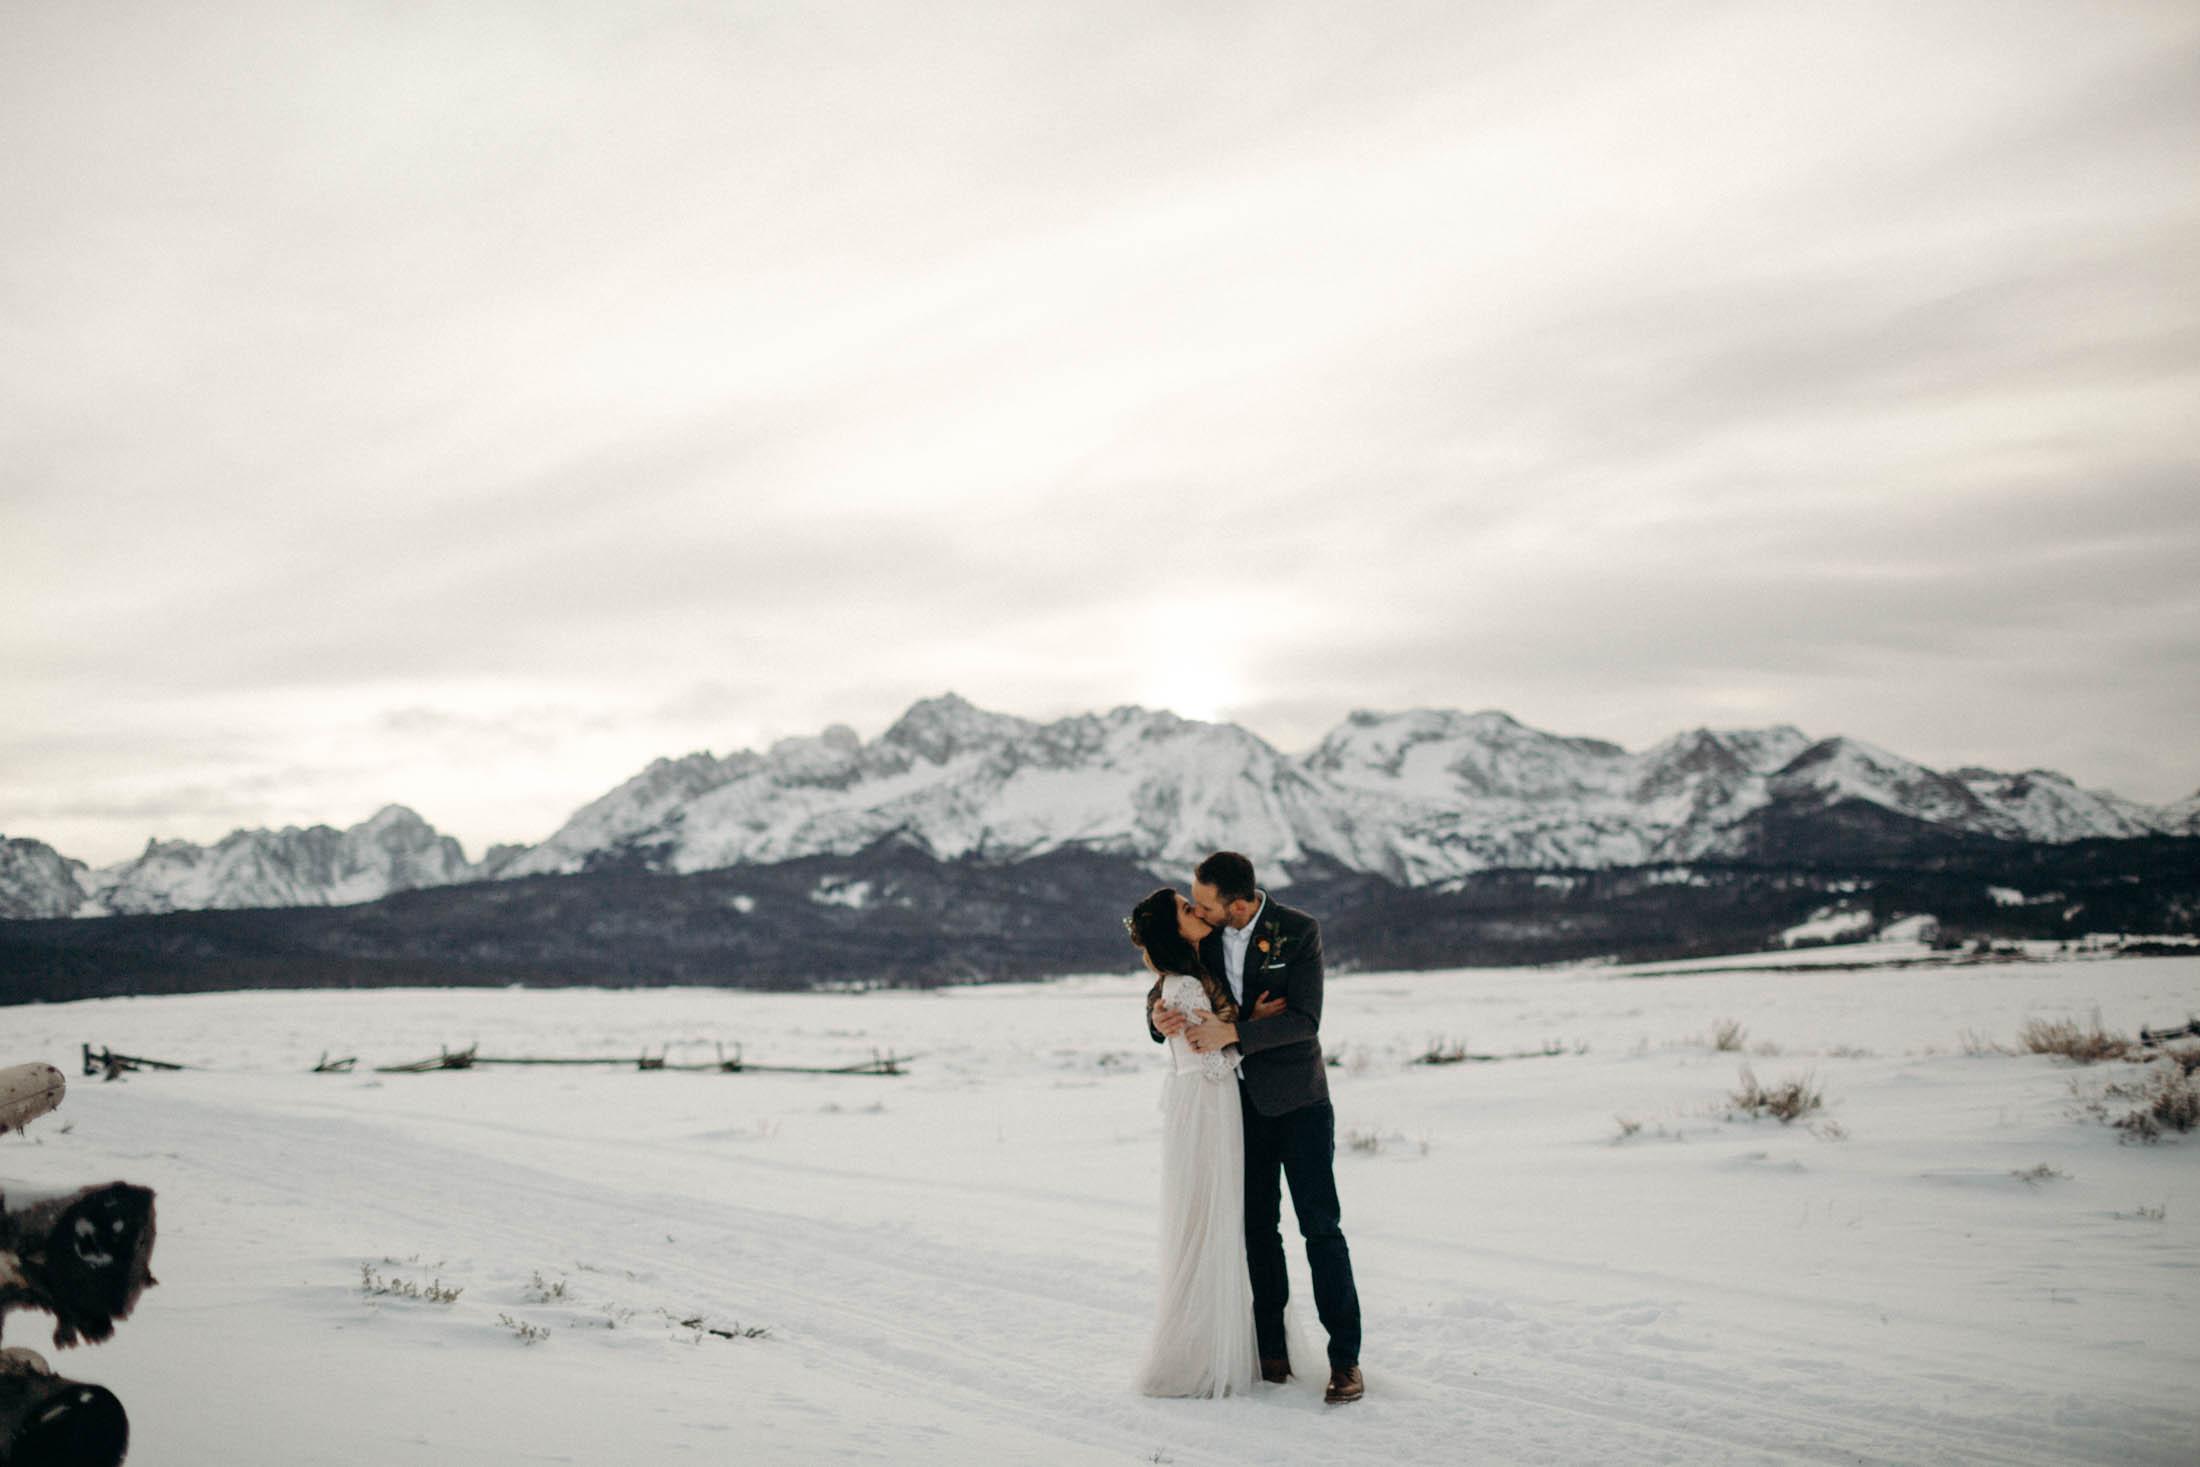 Creed & Angela | Stanley Elopement